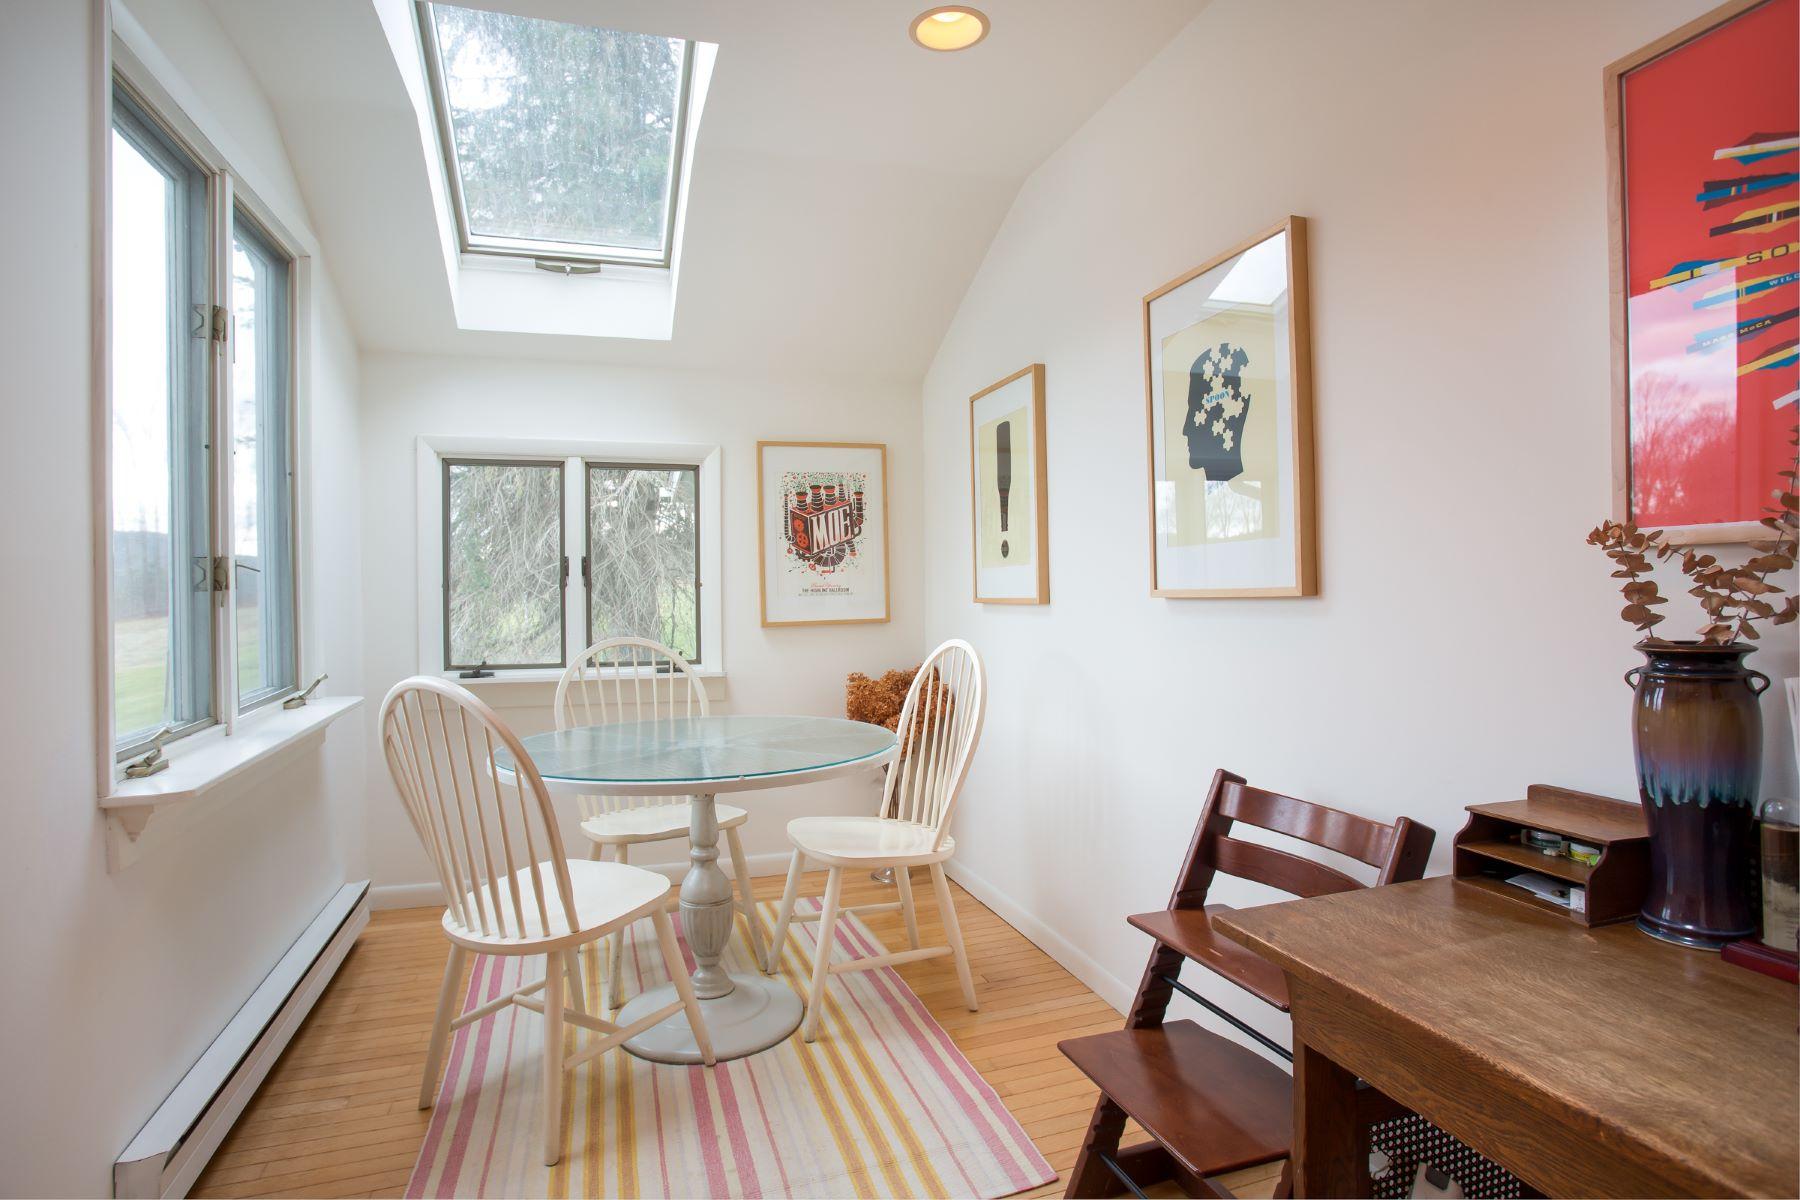 Additional photo for property listing at Contemporary Country Retreat 1748 County Route 5 Canaan, Nueva York 12029 Estados Unidos